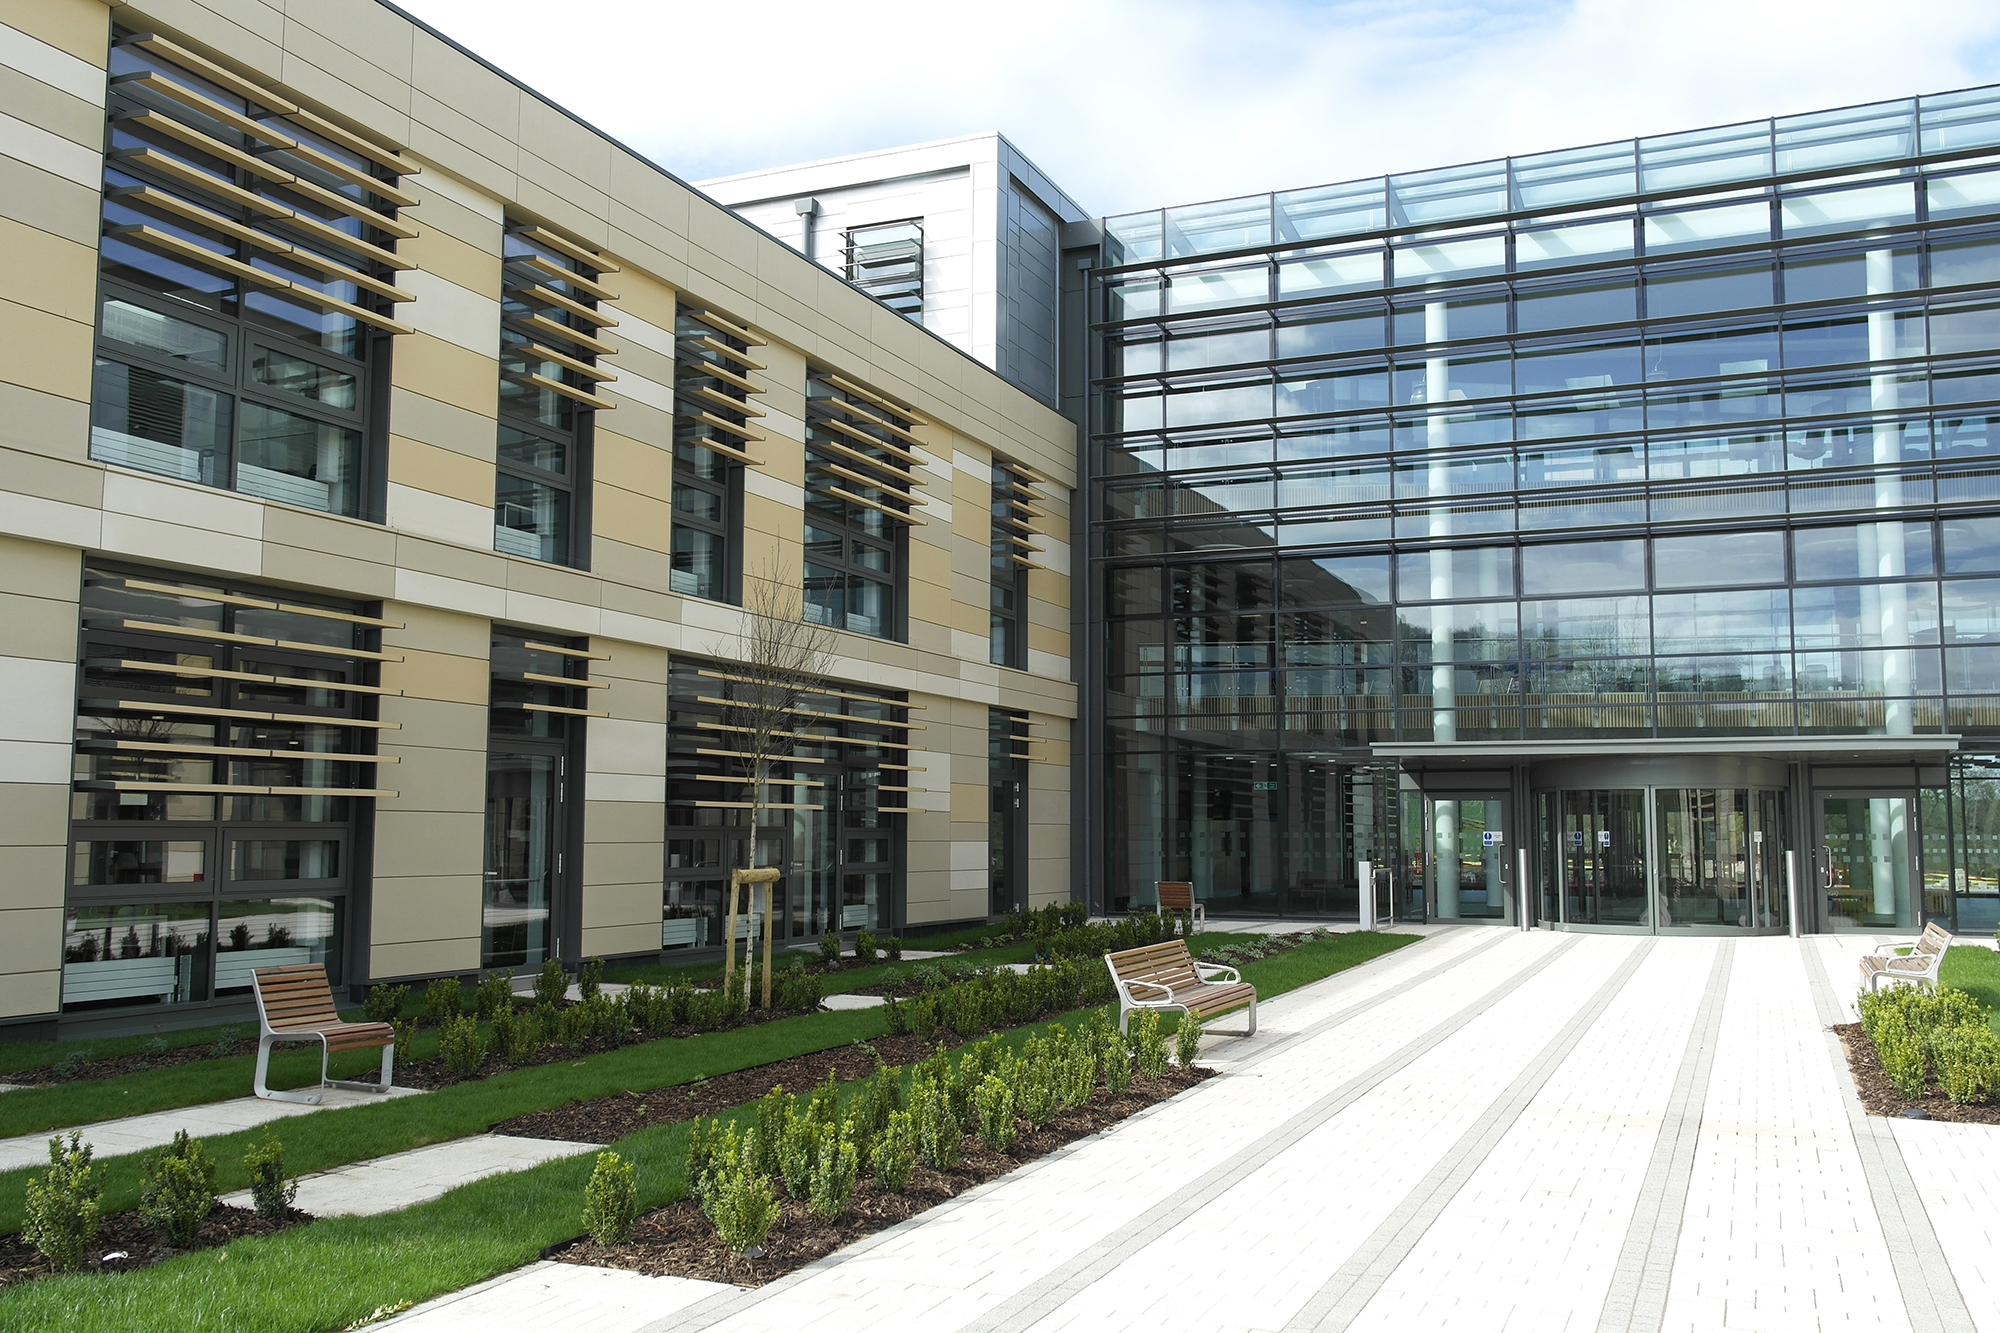 Lord Puttnam Opens New Bath Spa Building The Virtual